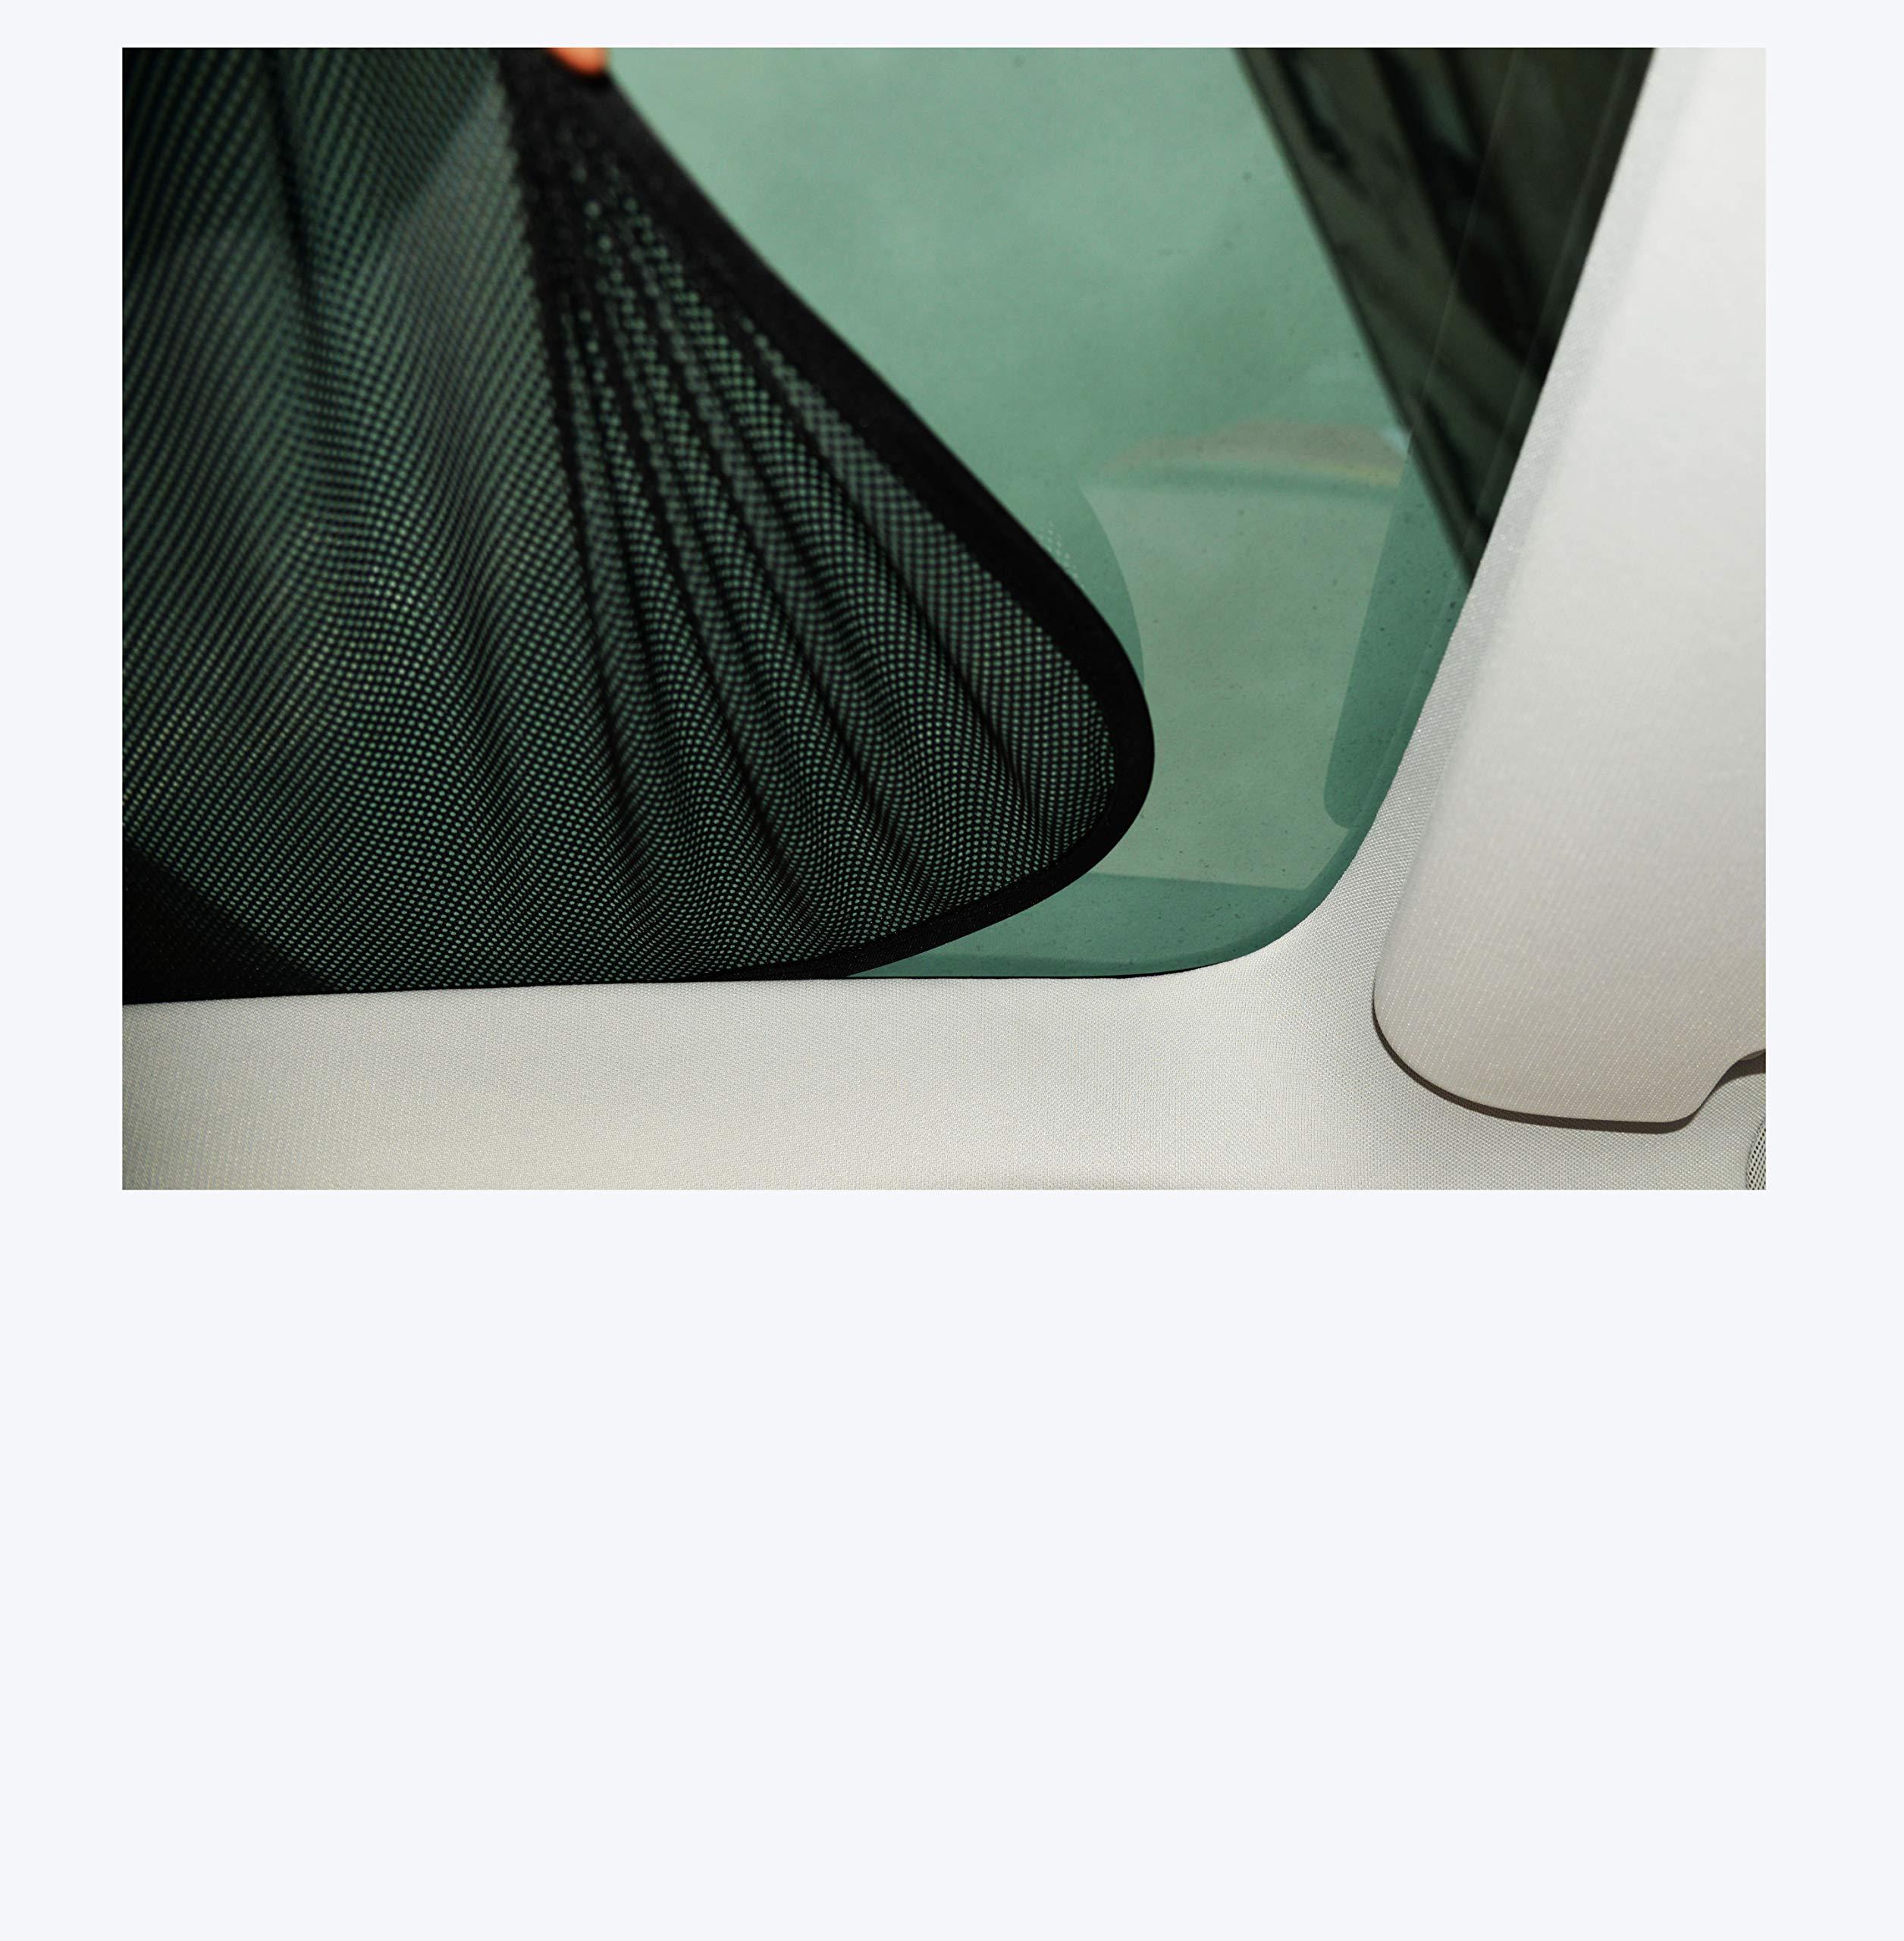 EVFIT Car Windows Sunshade Glass Roof Sunroof Sun Shade Holder Folding Customize Tesla Model 3 2018 2019 Accessories (Front Window)